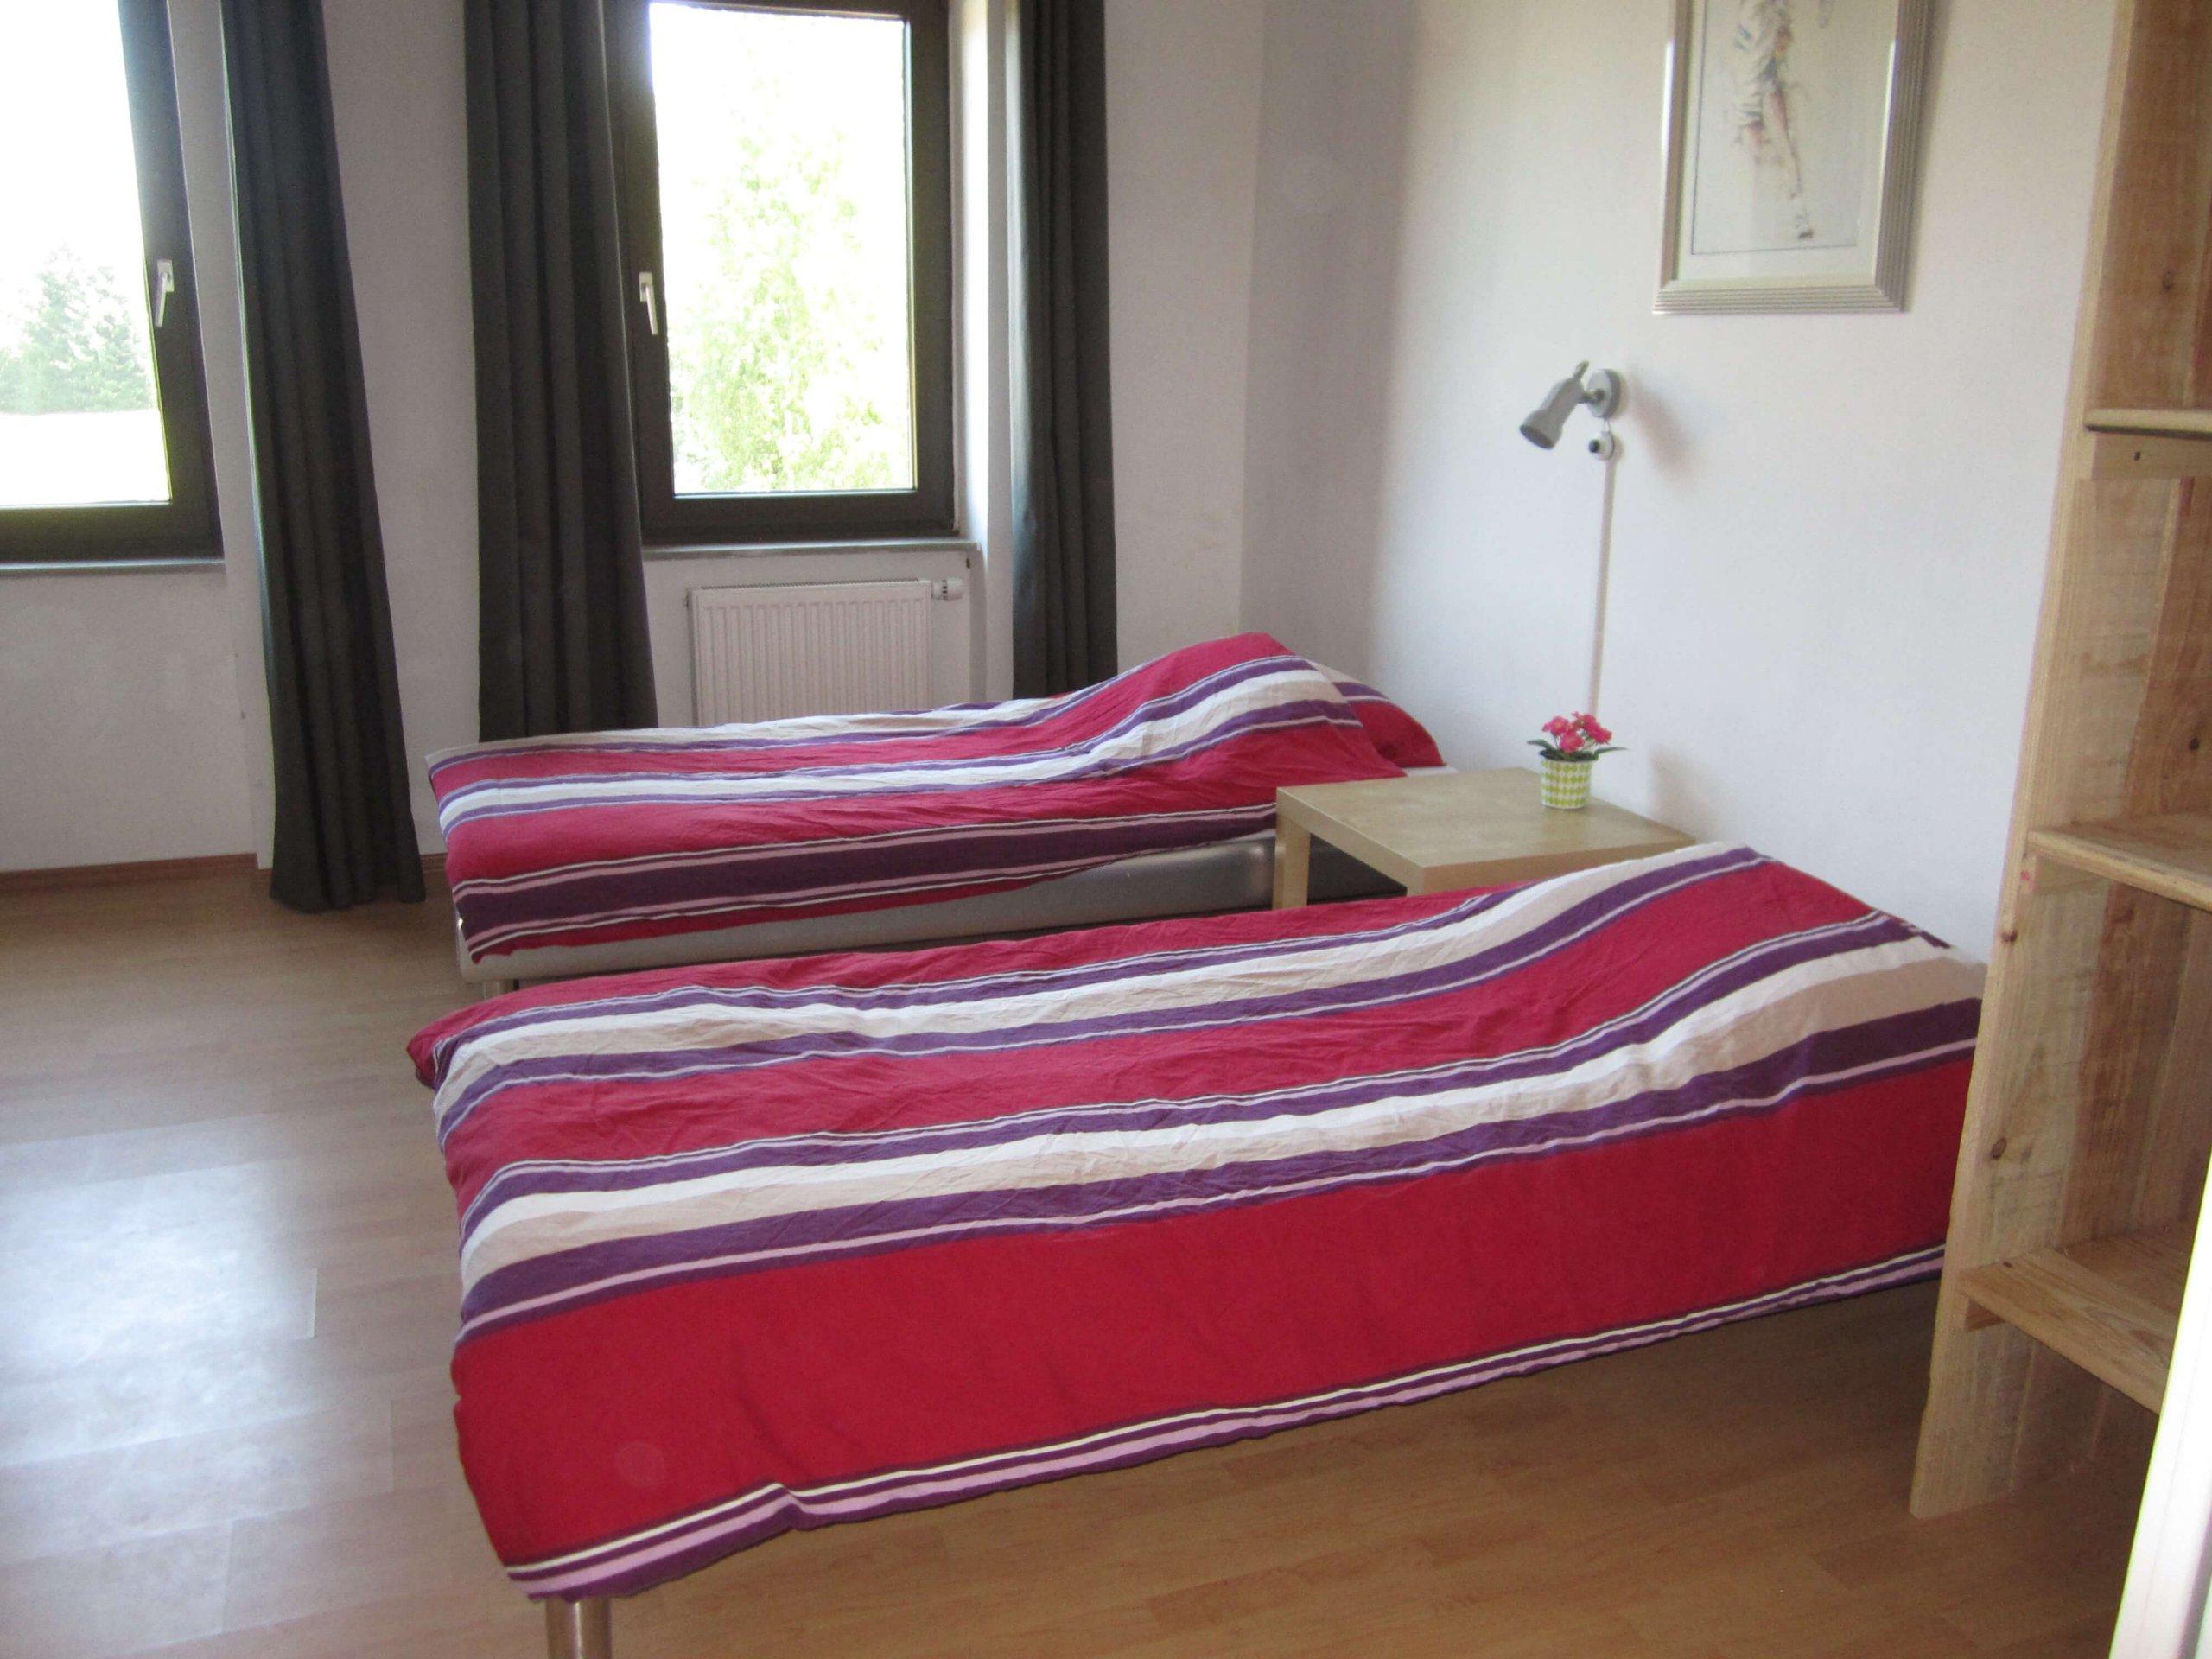 Slaapkamer waldfriede seesbach met wastafel